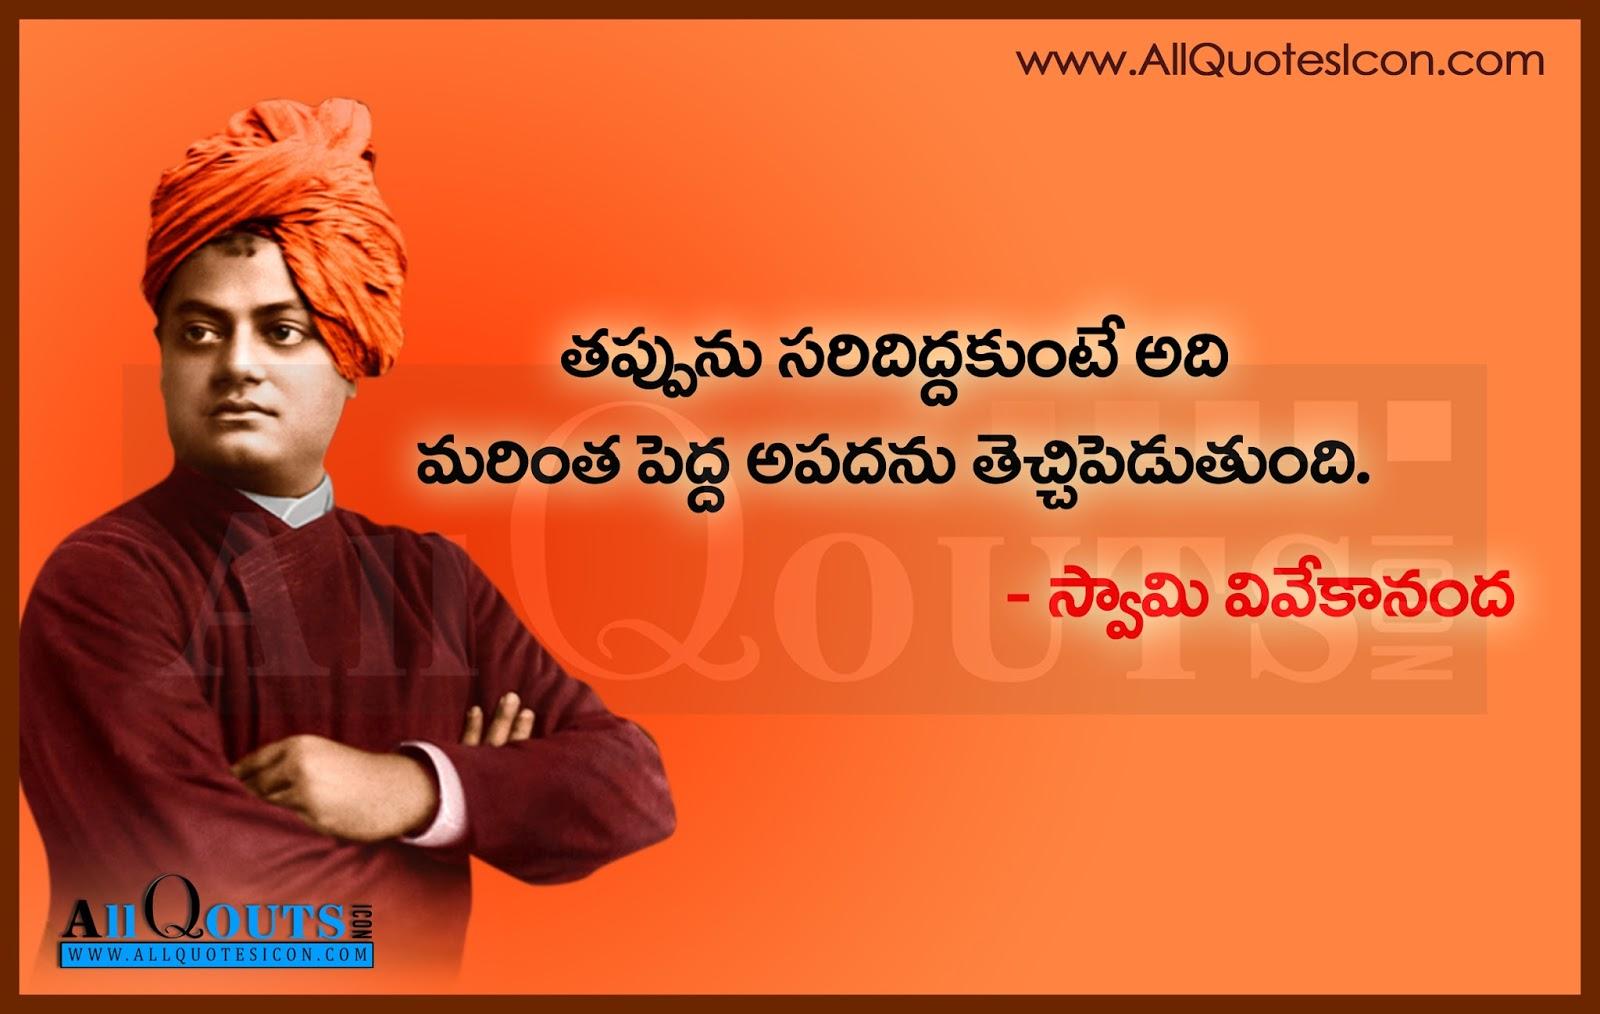 Telugu Quotation Wallpapers   Swami Vivekananda Quotes On Exams 1600x1014